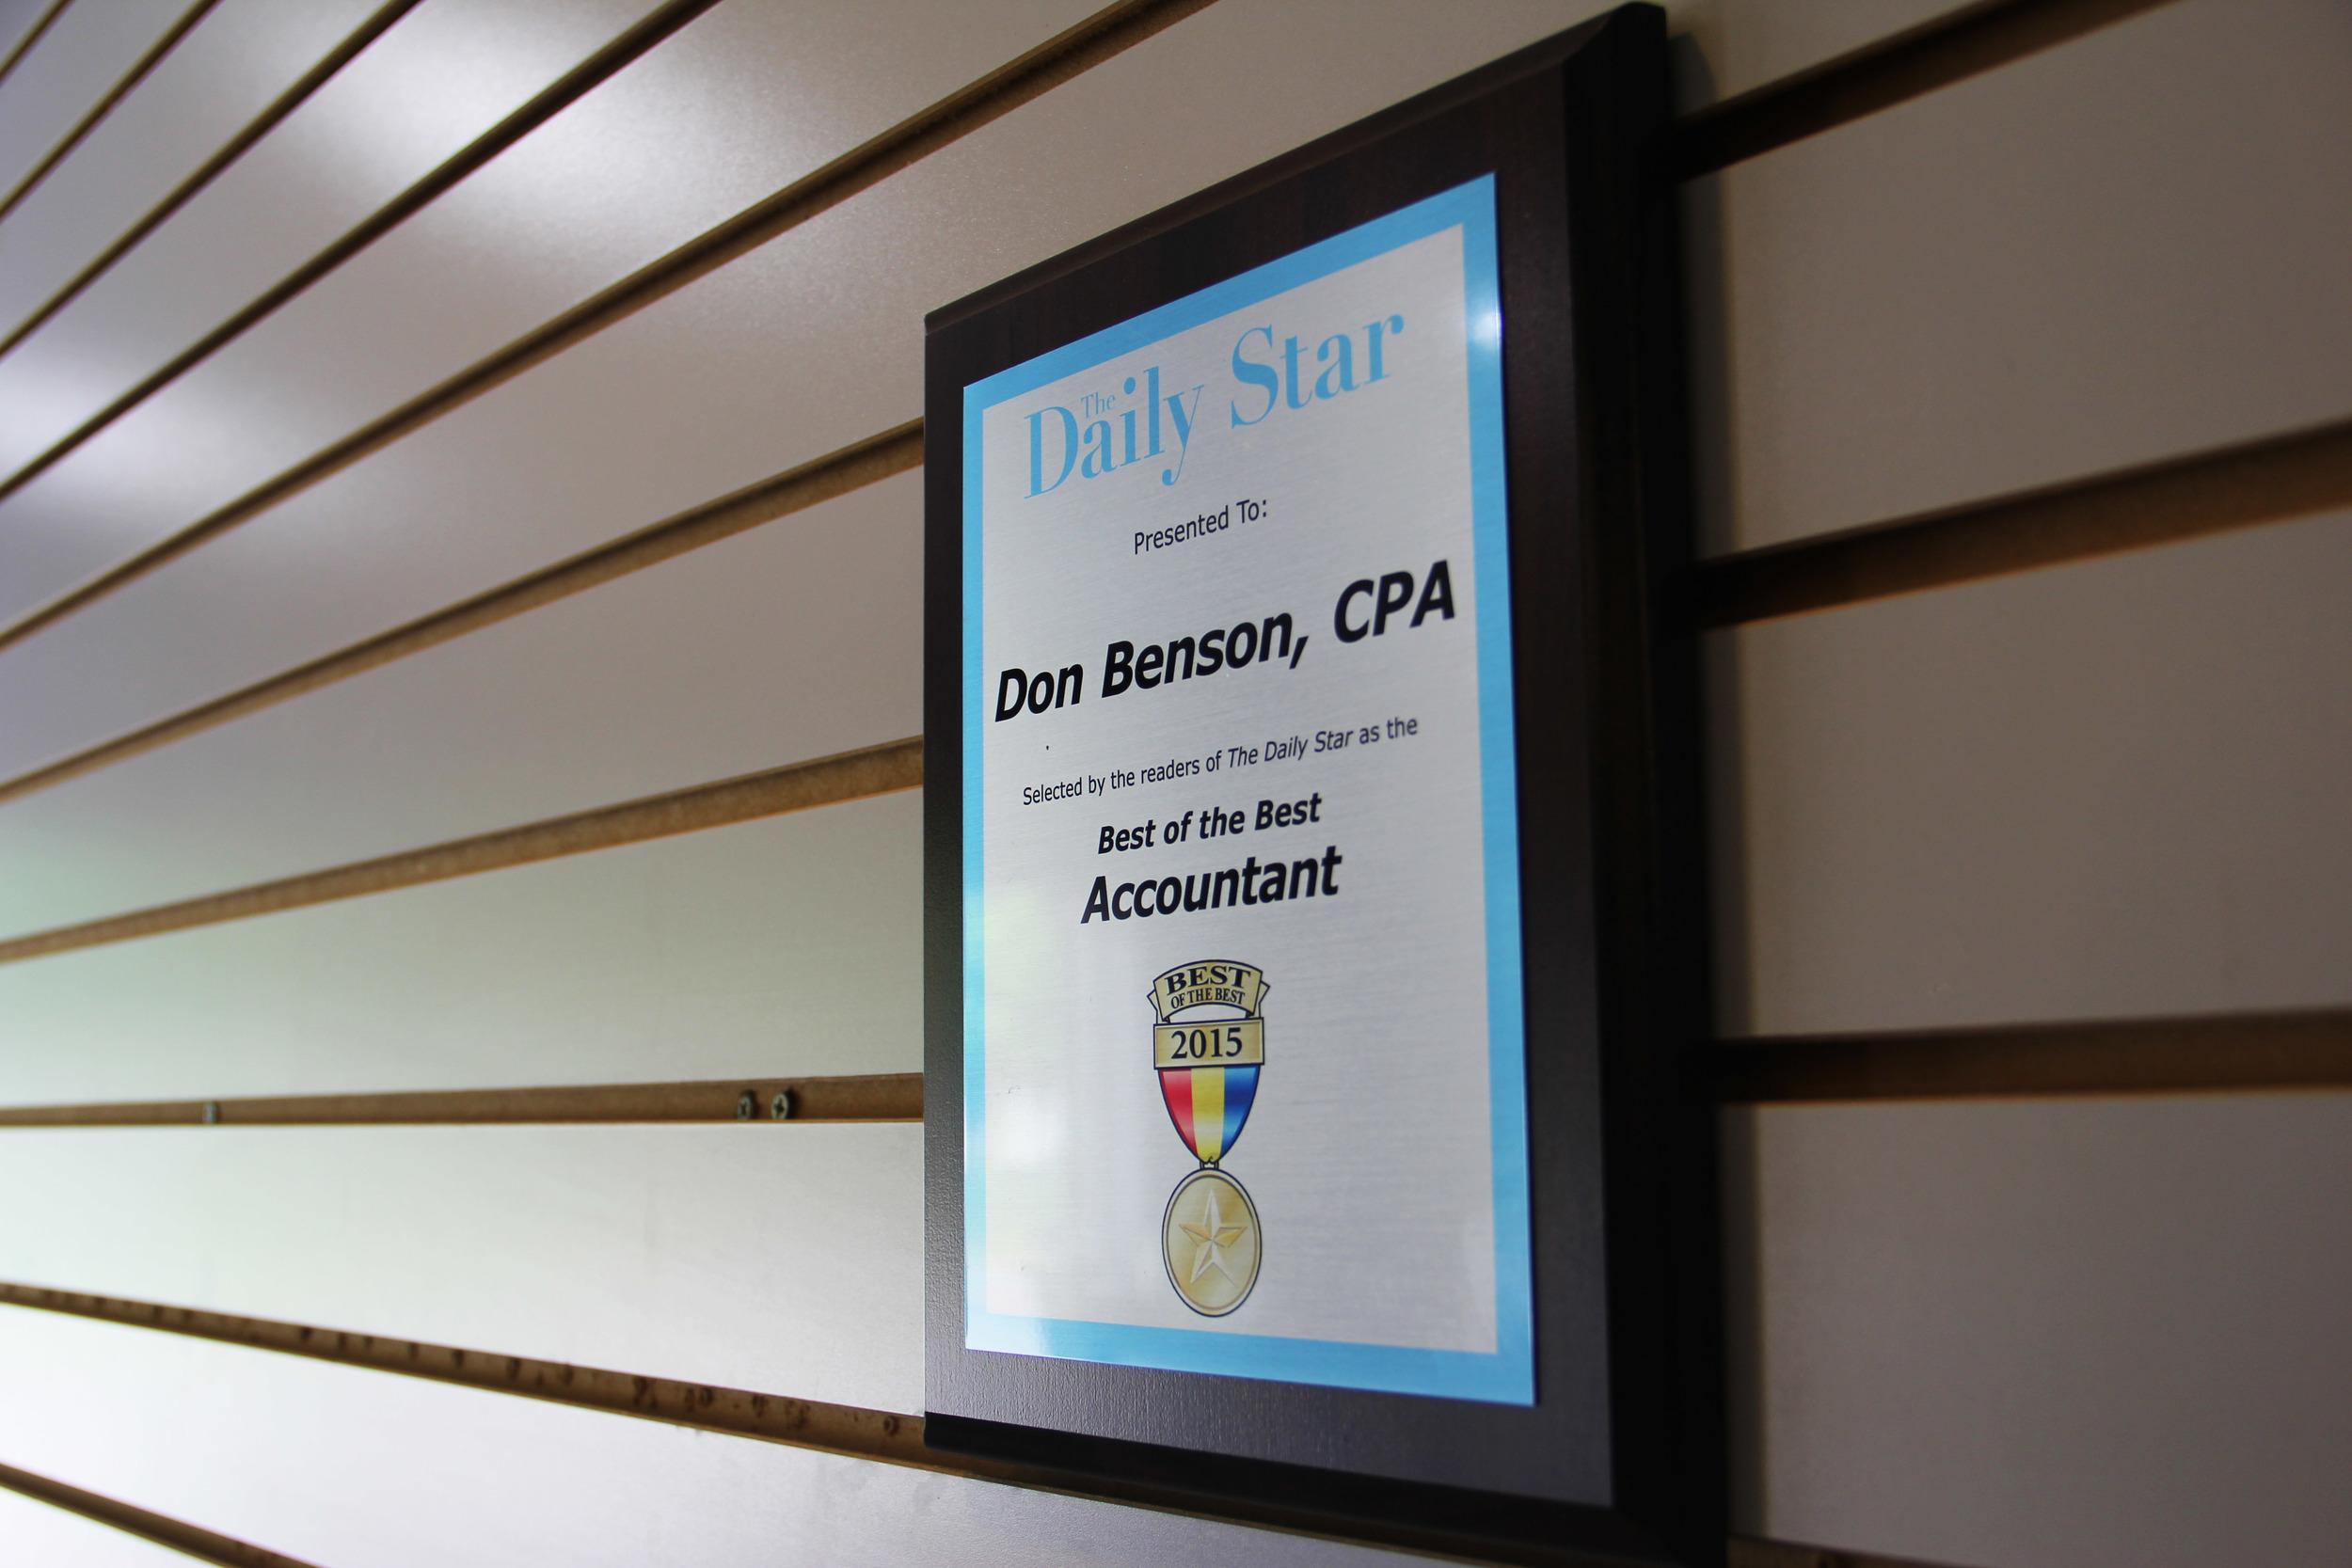 Daily star award.jpg